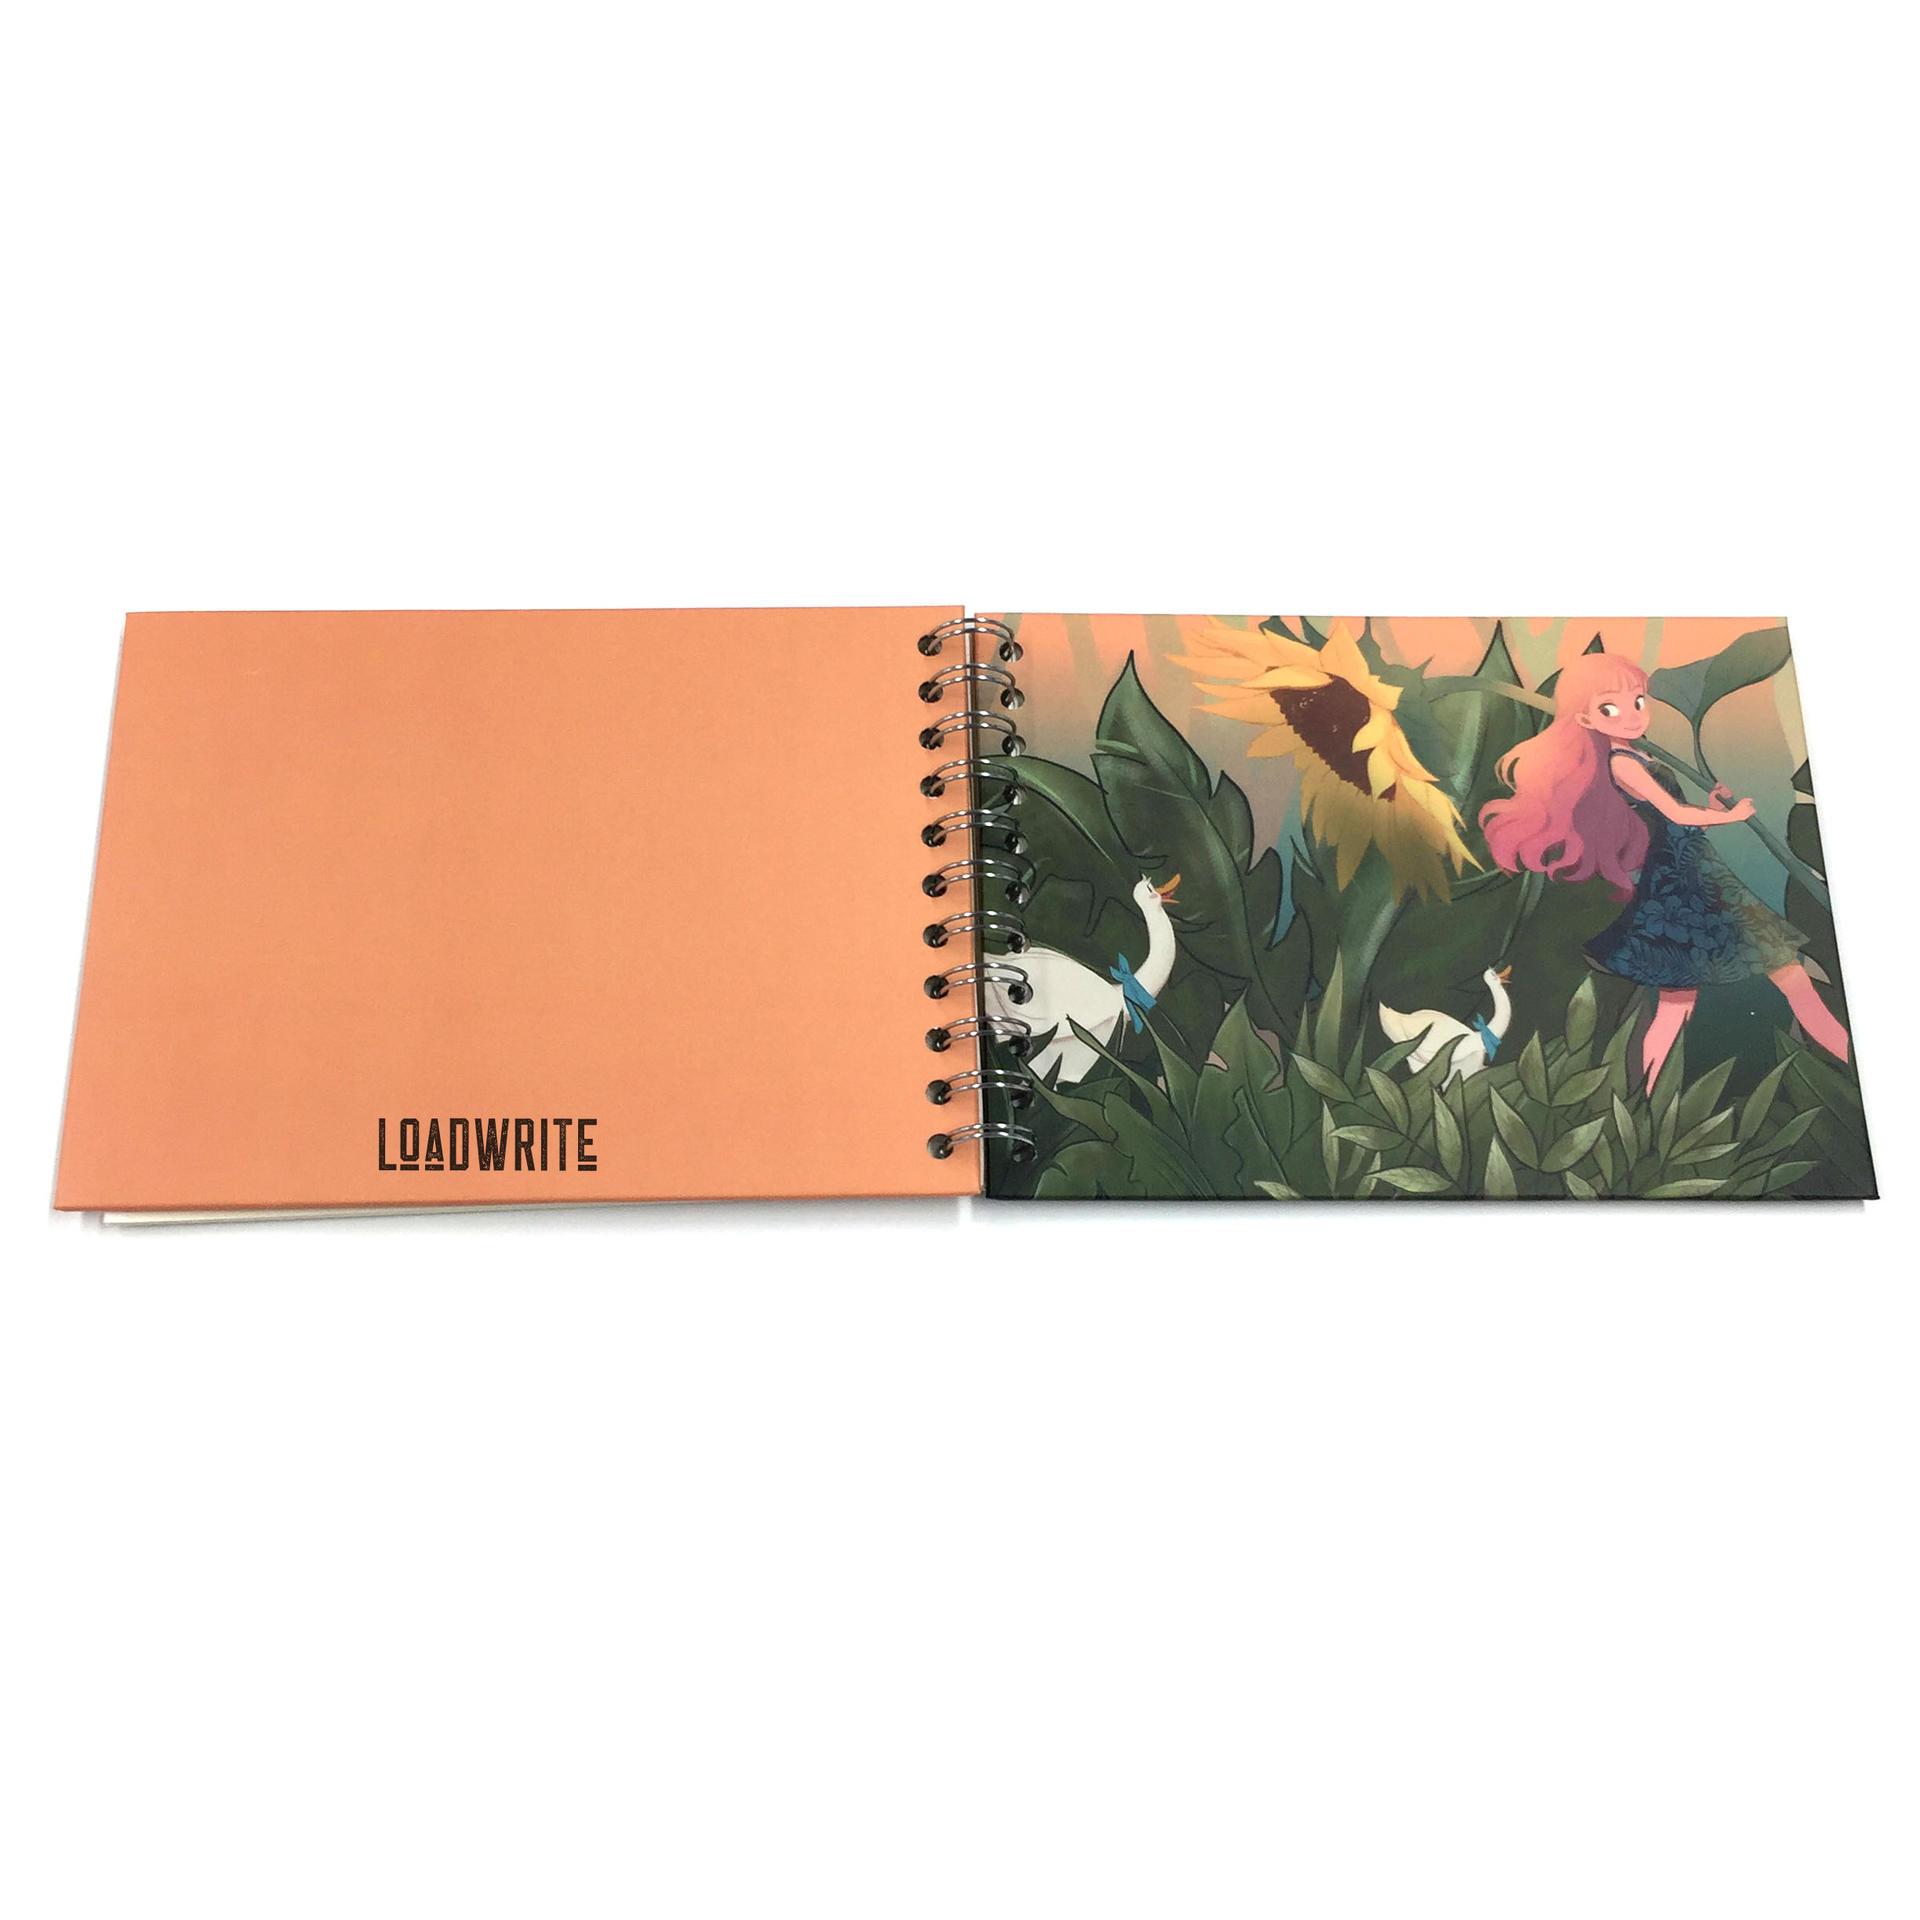 Loadwrite self adhesive scrapbook white phoro albums